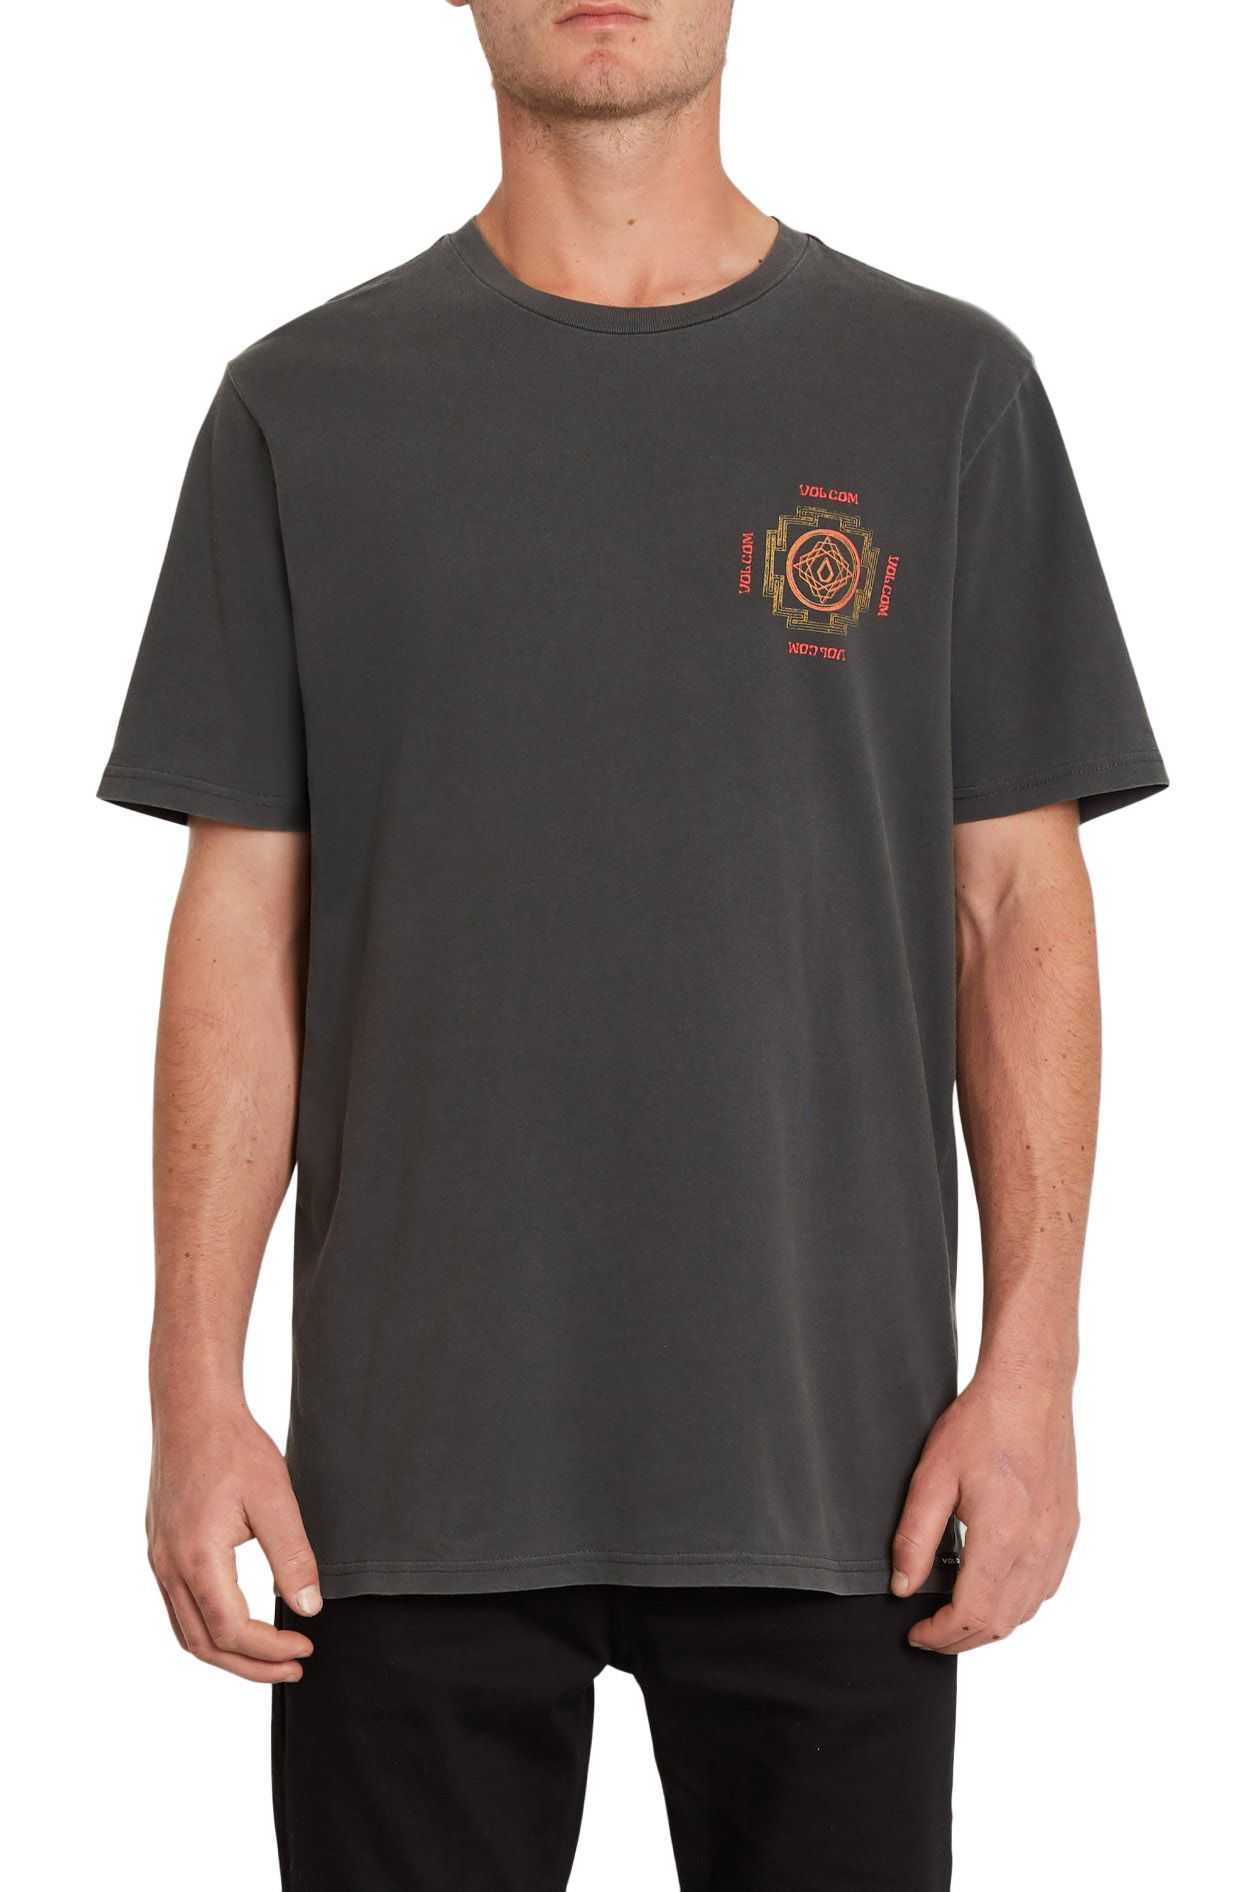 T-Shirt Volcom PSYCHONIC S/S TEE Black